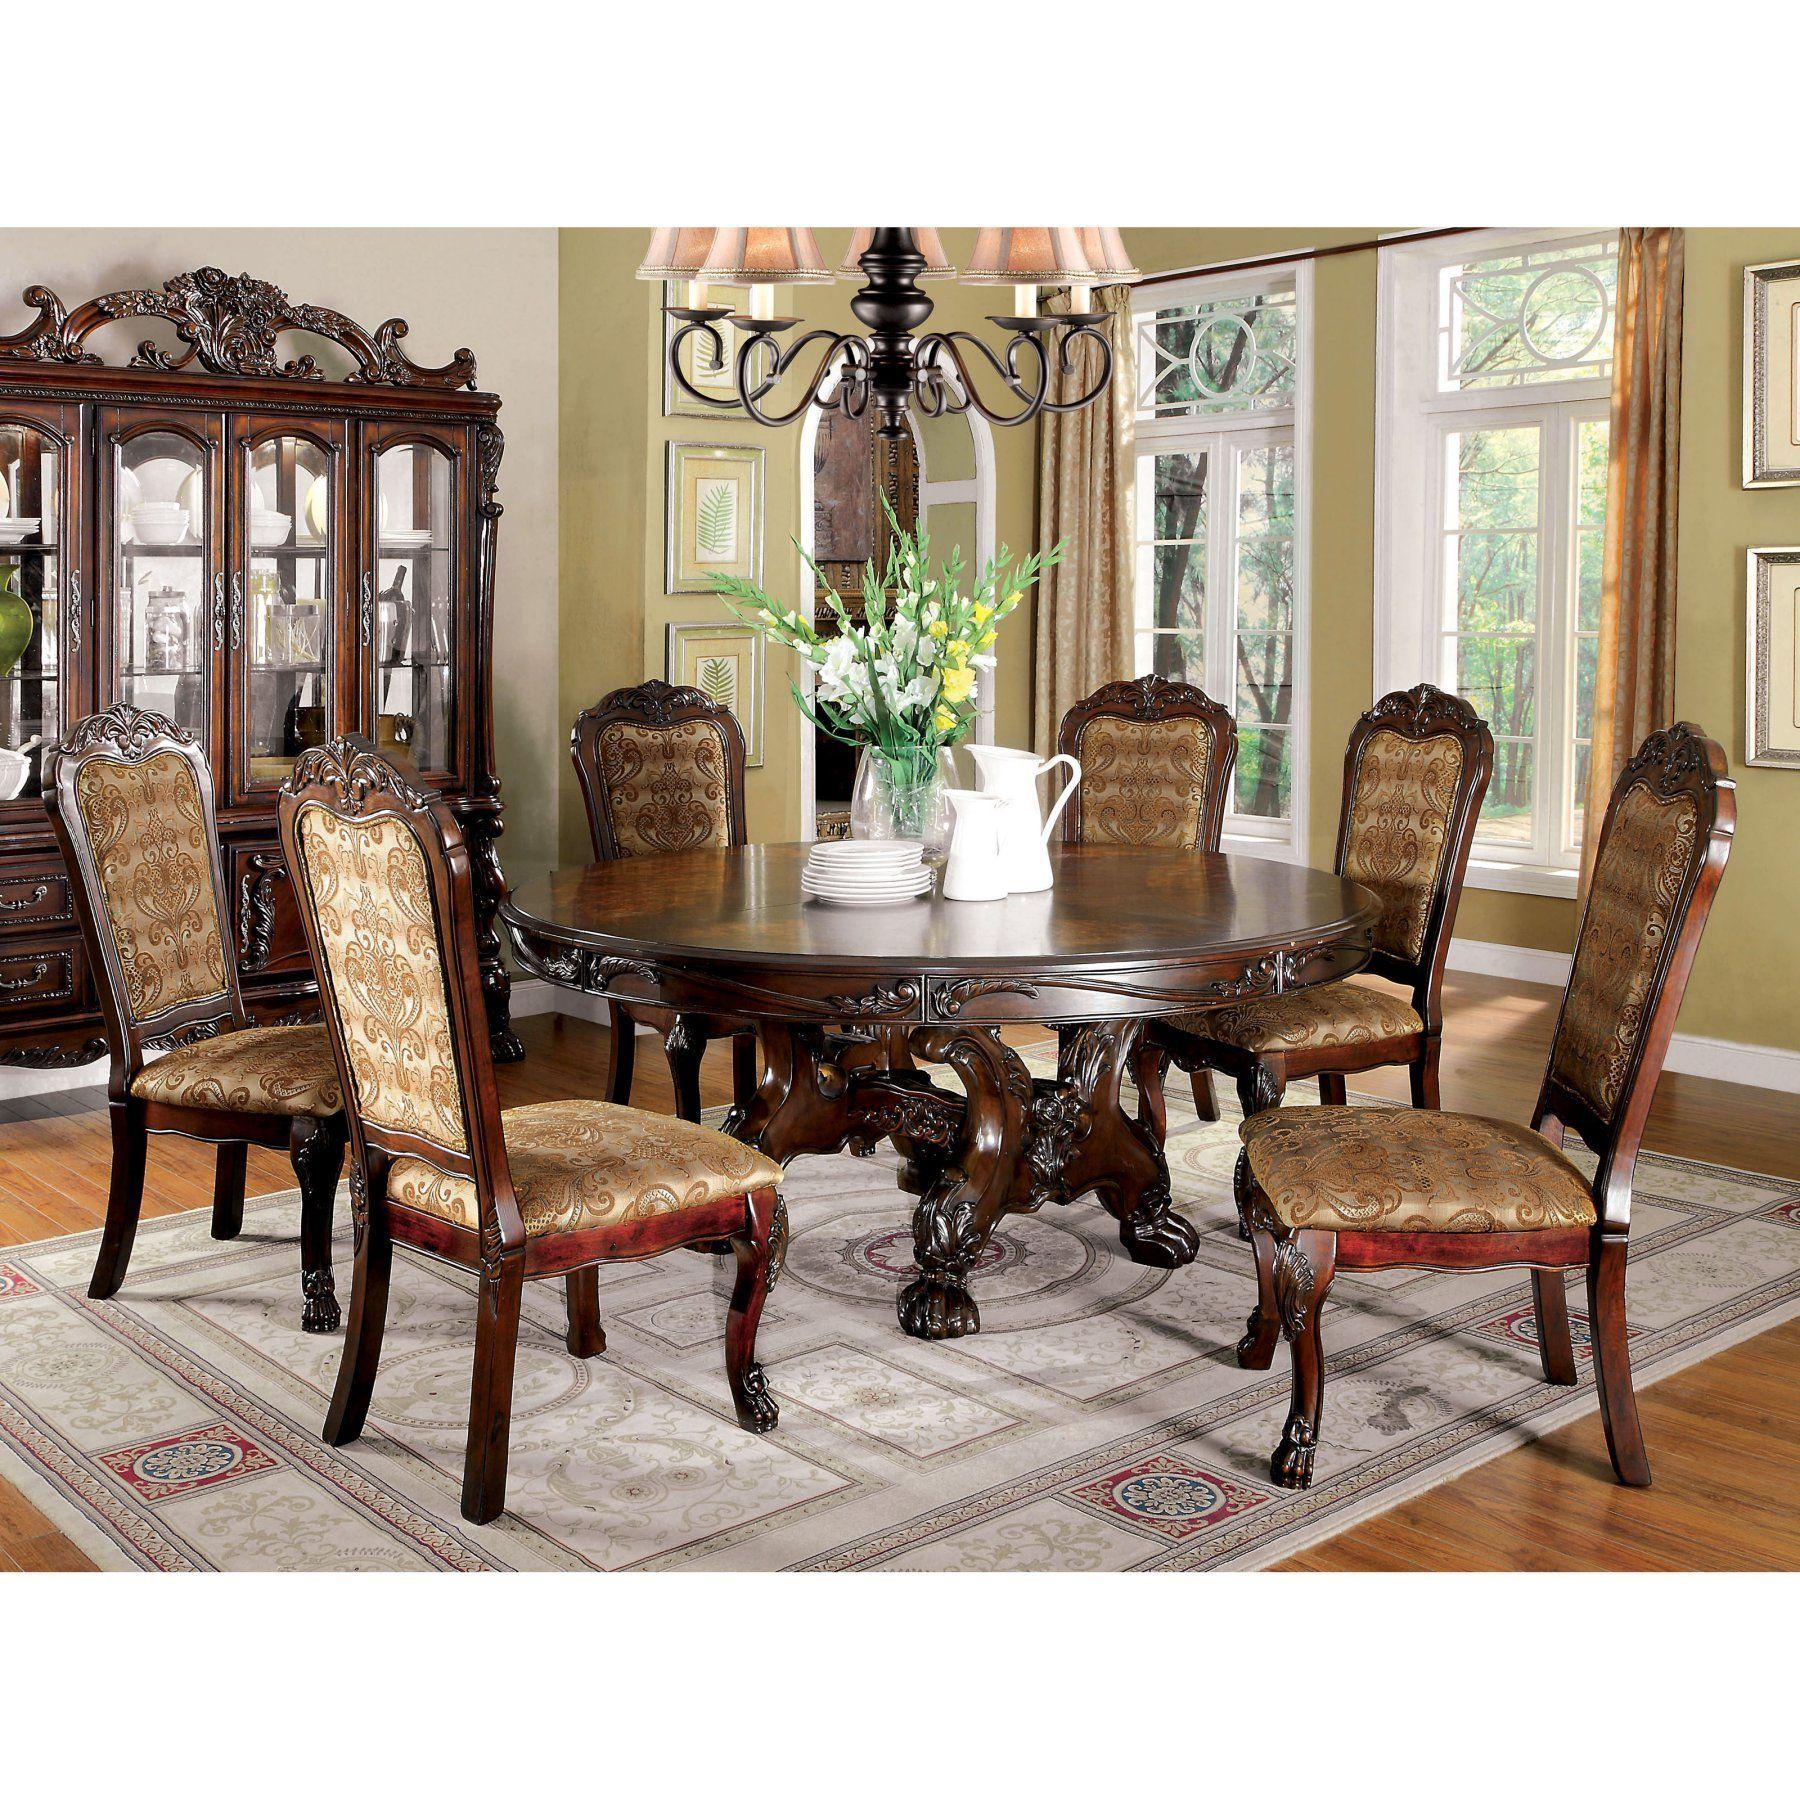 Furniture of America Evangeline Elegant 7-Piece Round Dining Table ...